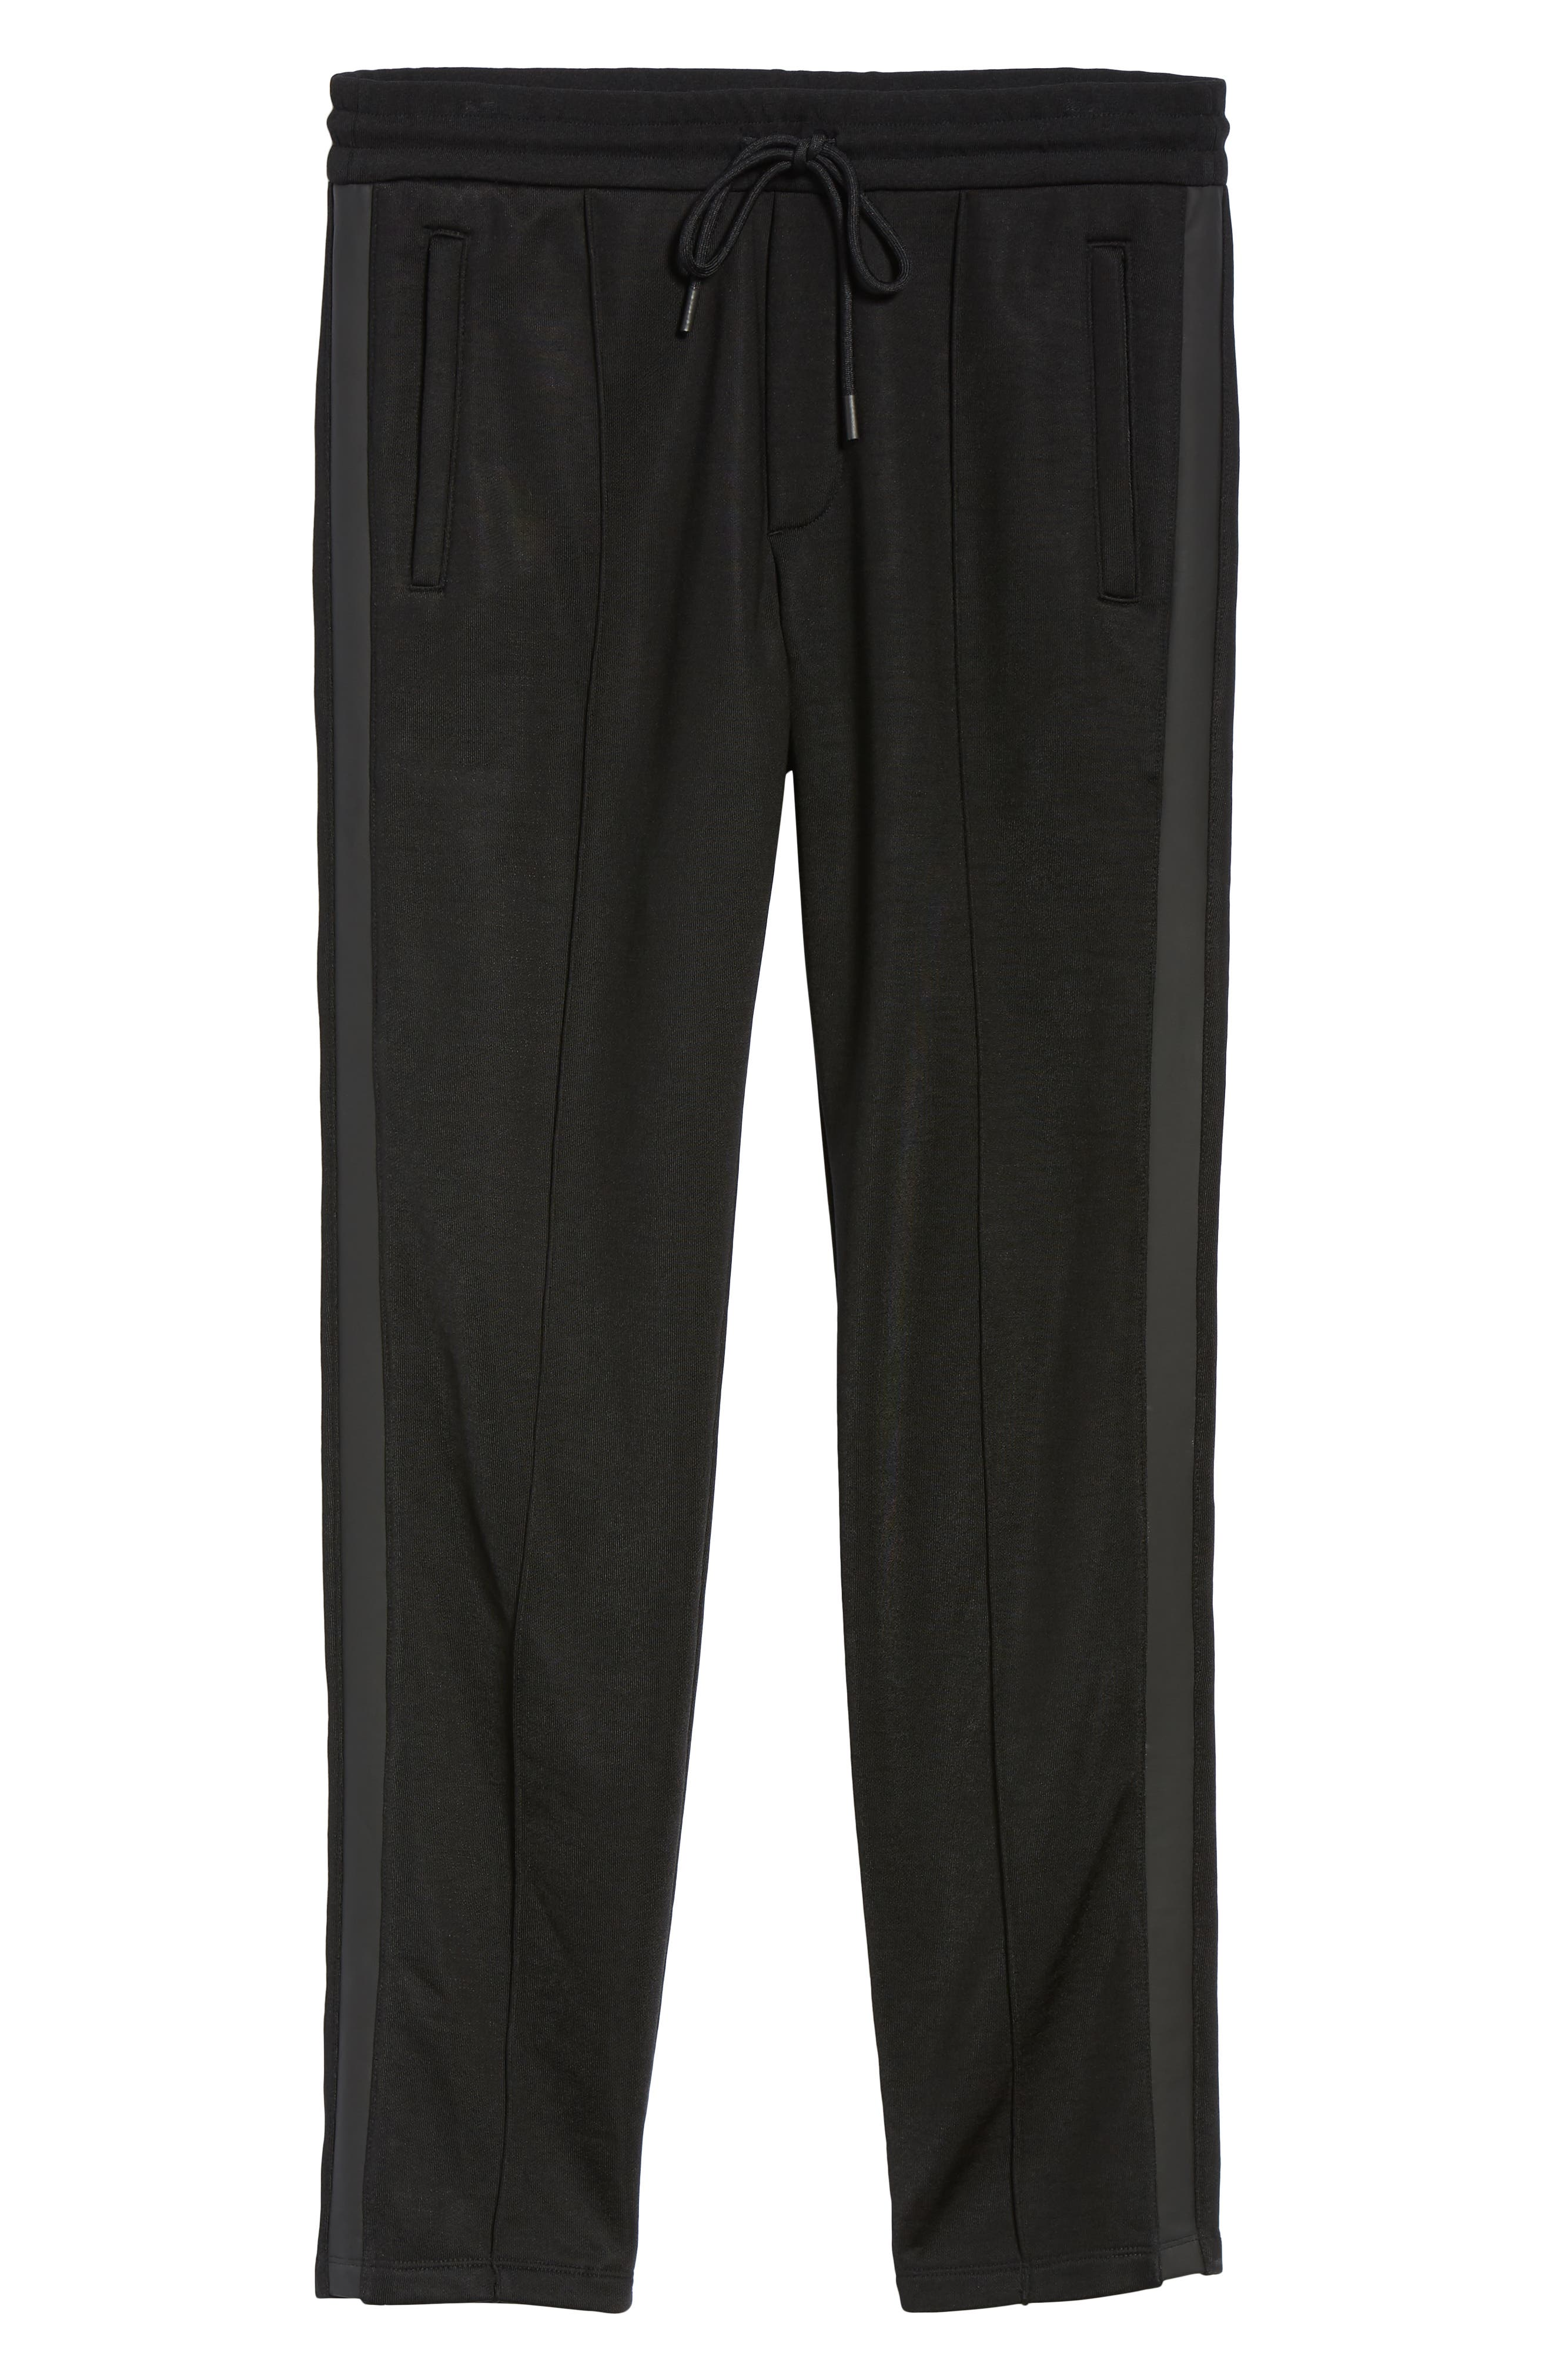 Heat Seal Classic Track Pants,                             Alternate thumbnail 6, color,                             BLACK